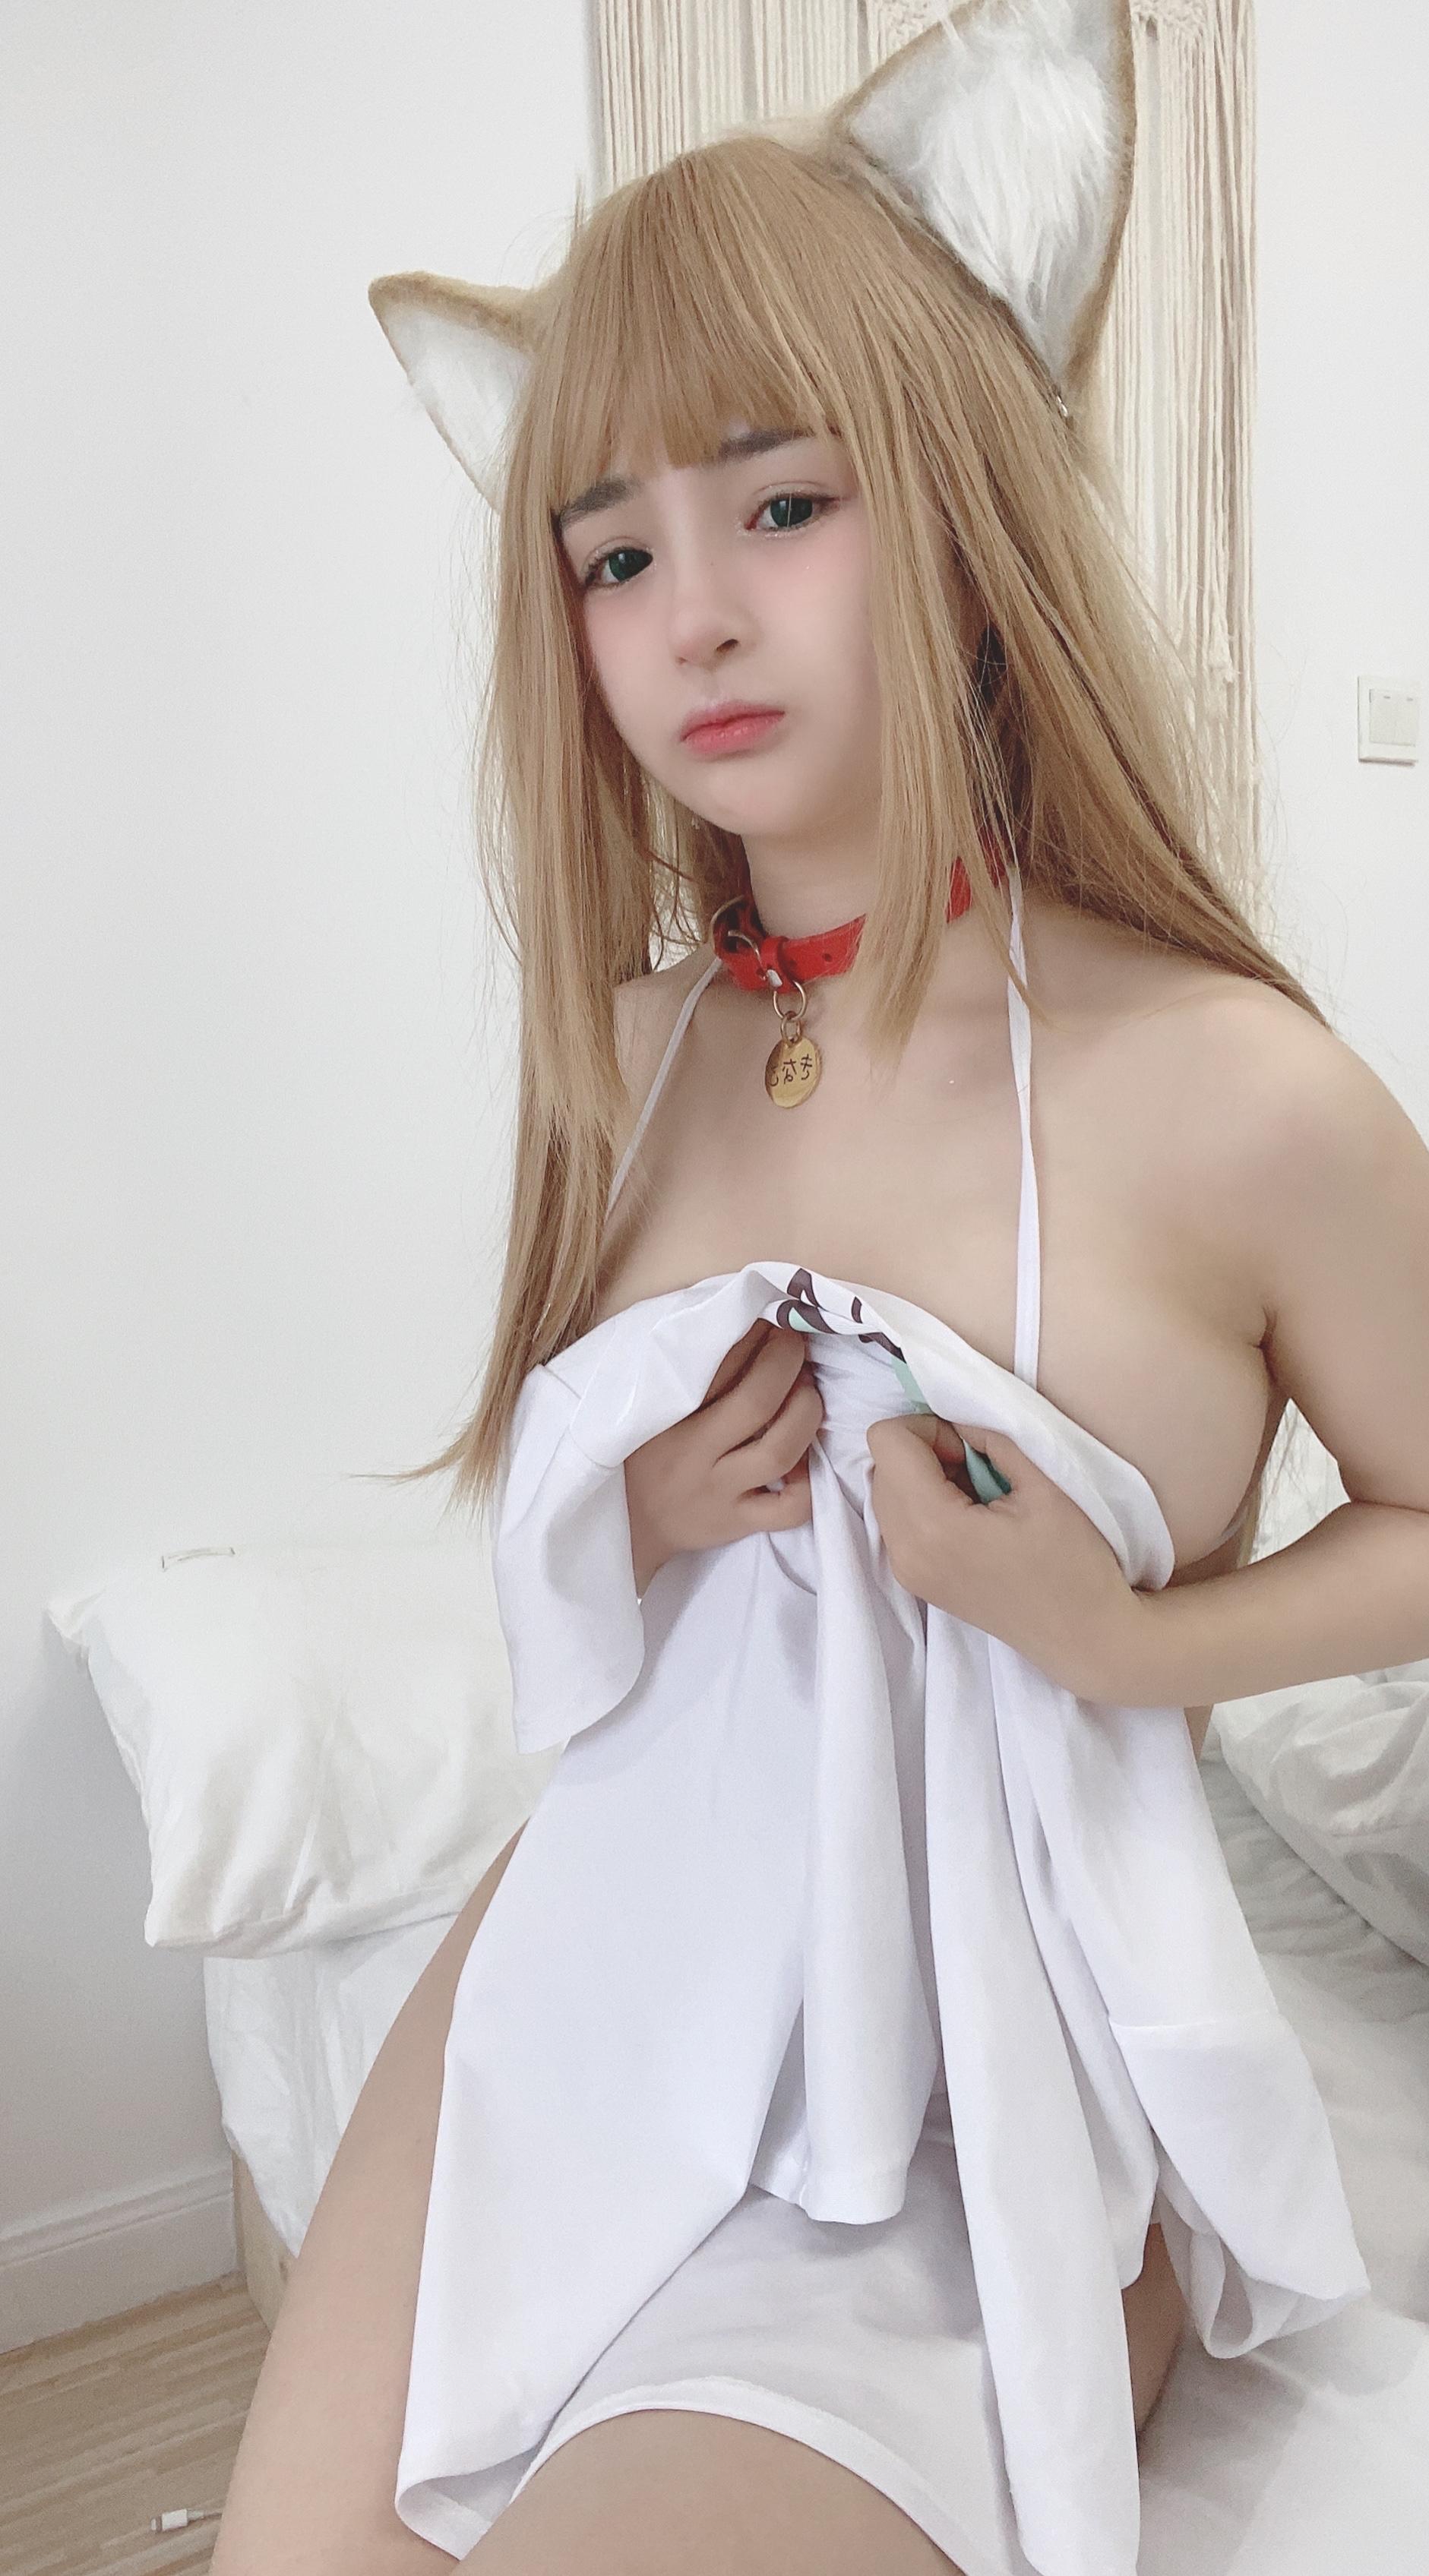 [桜井宁宁] NO.028 猫娘[50P-171MB]